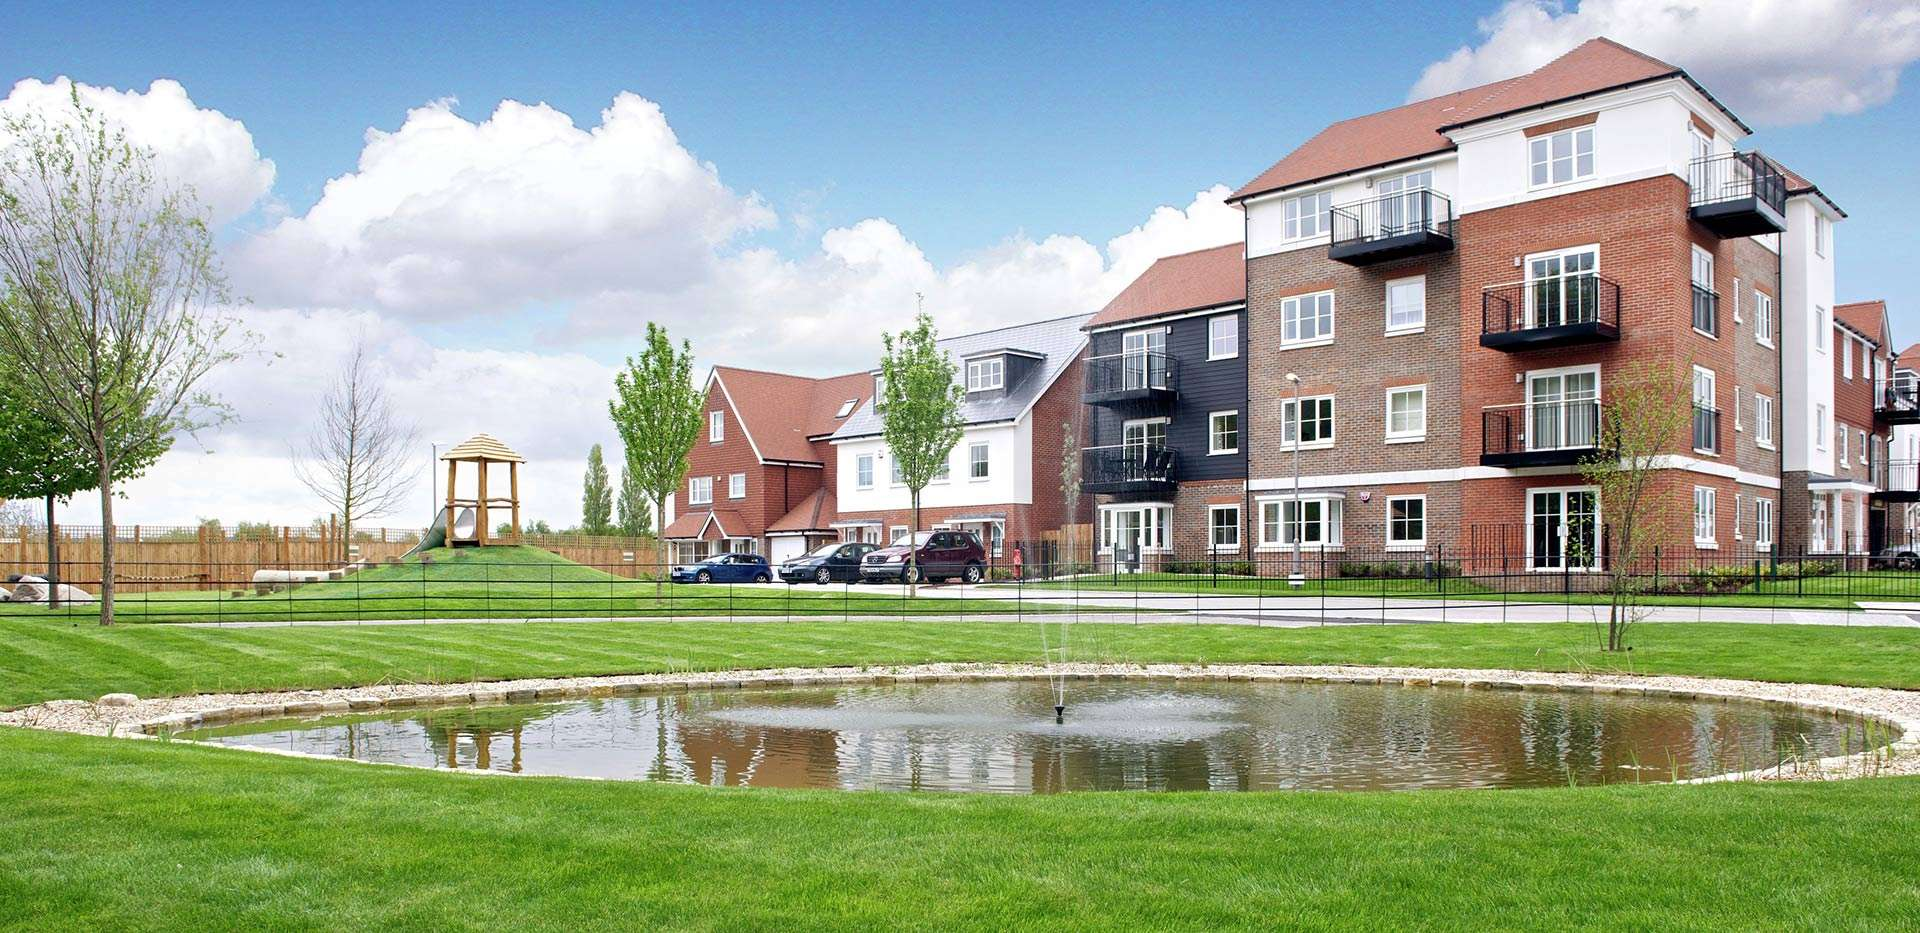 Ryewood Pond.jpg